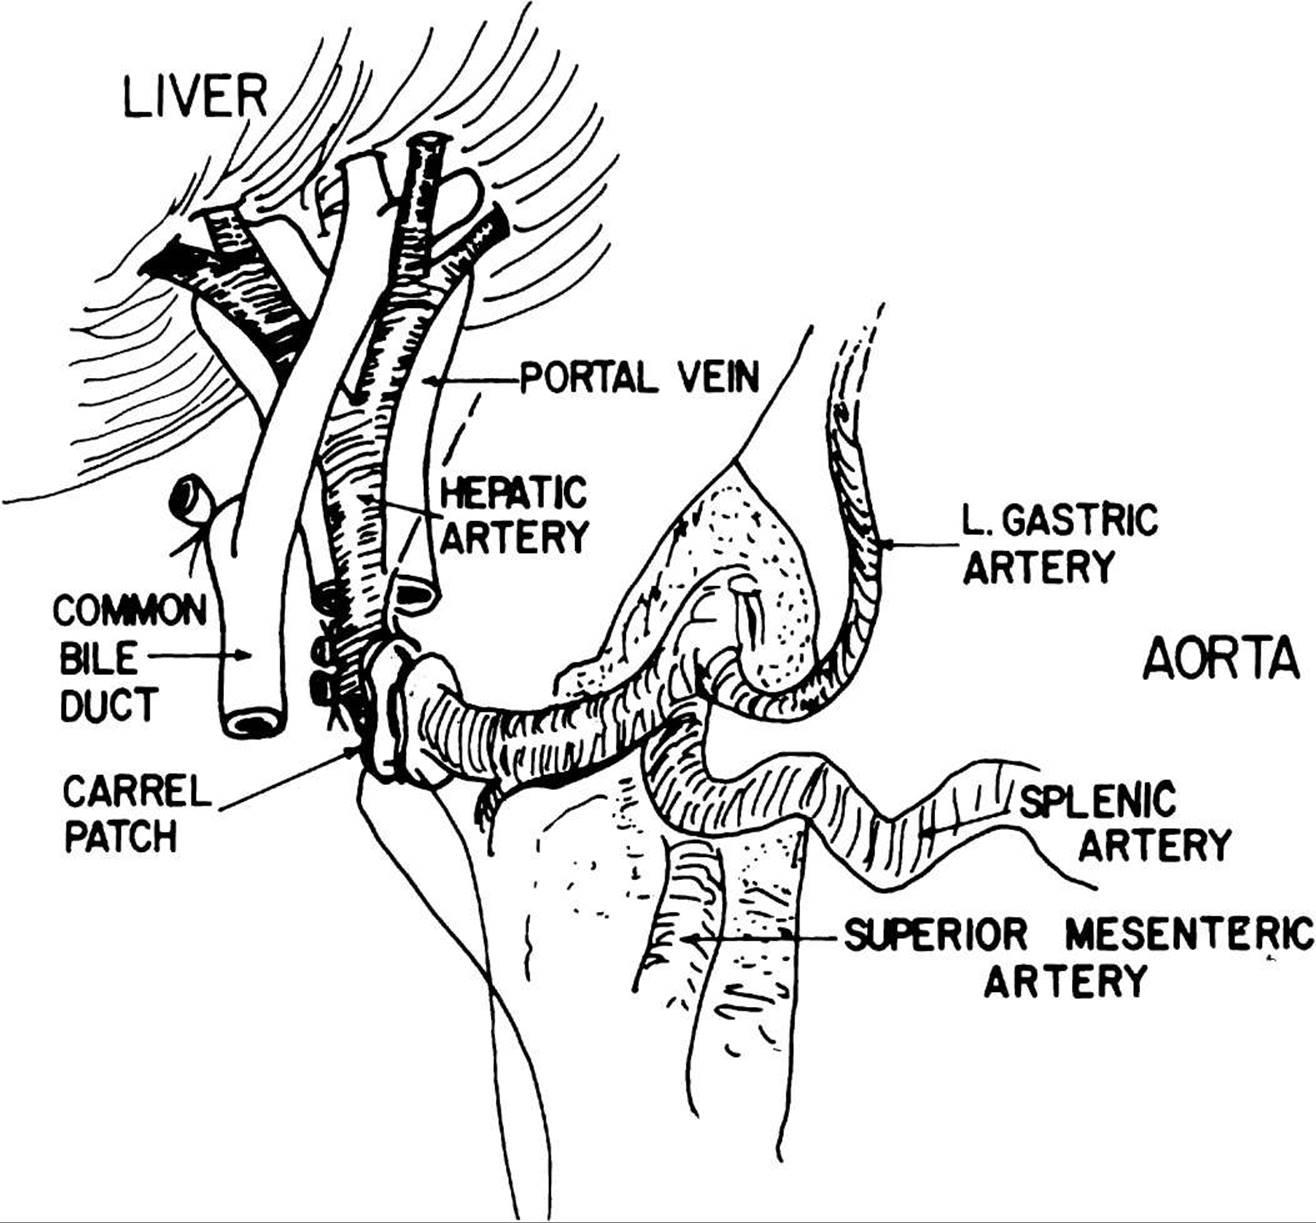 abdominal vascular sonography